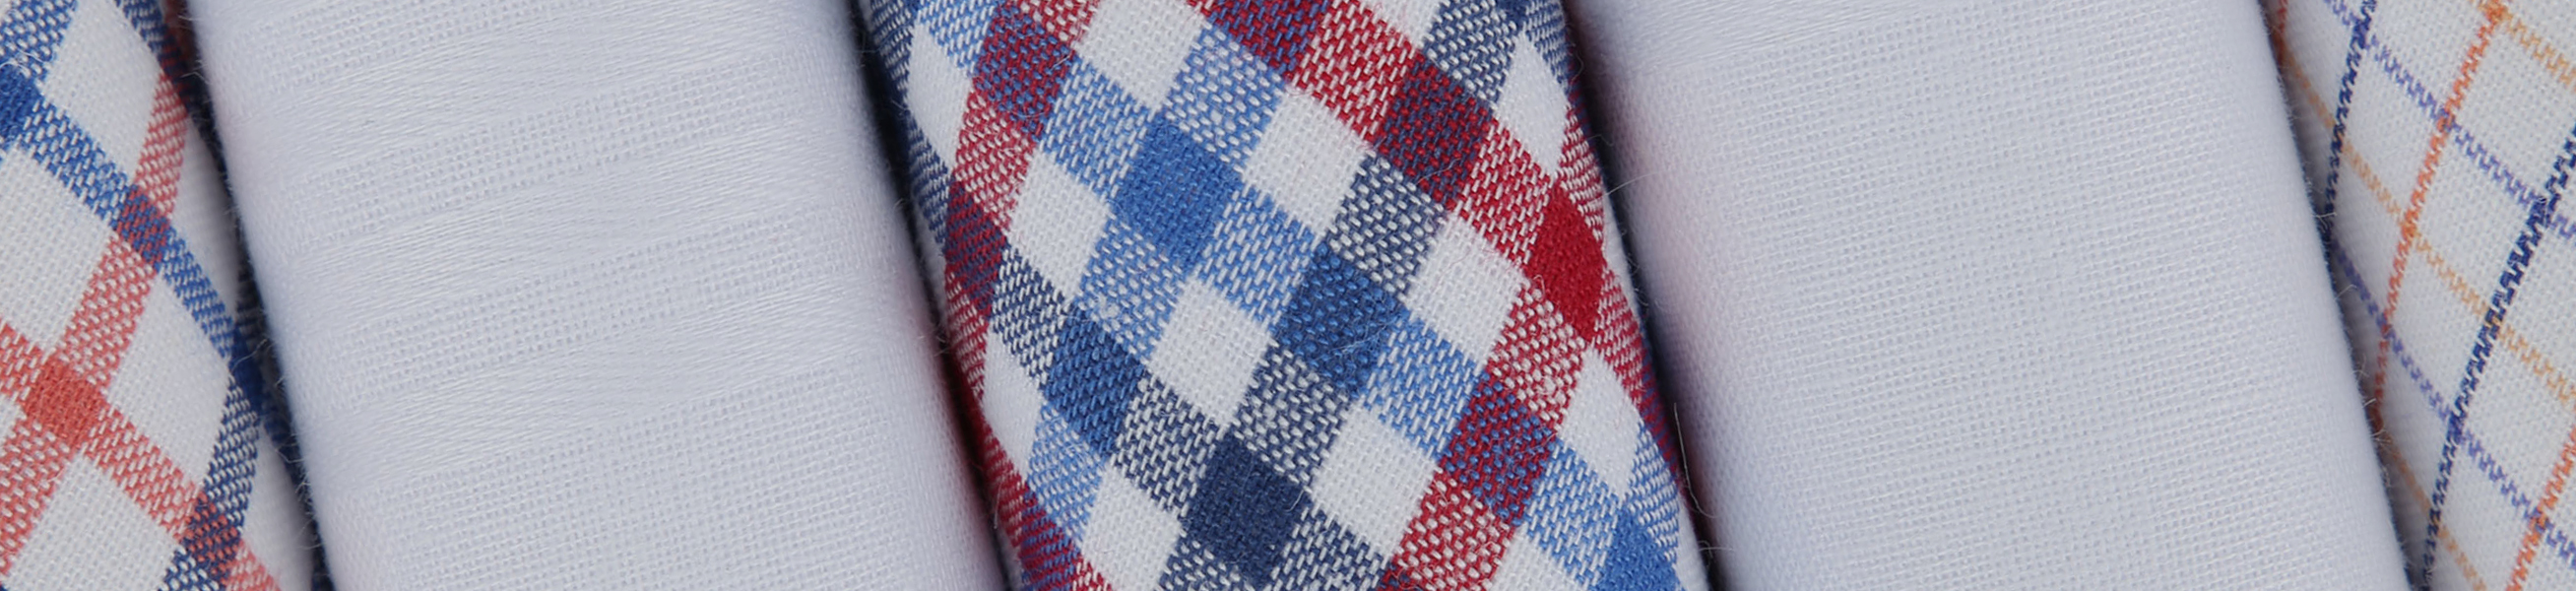 White Men's Handkerchiefs